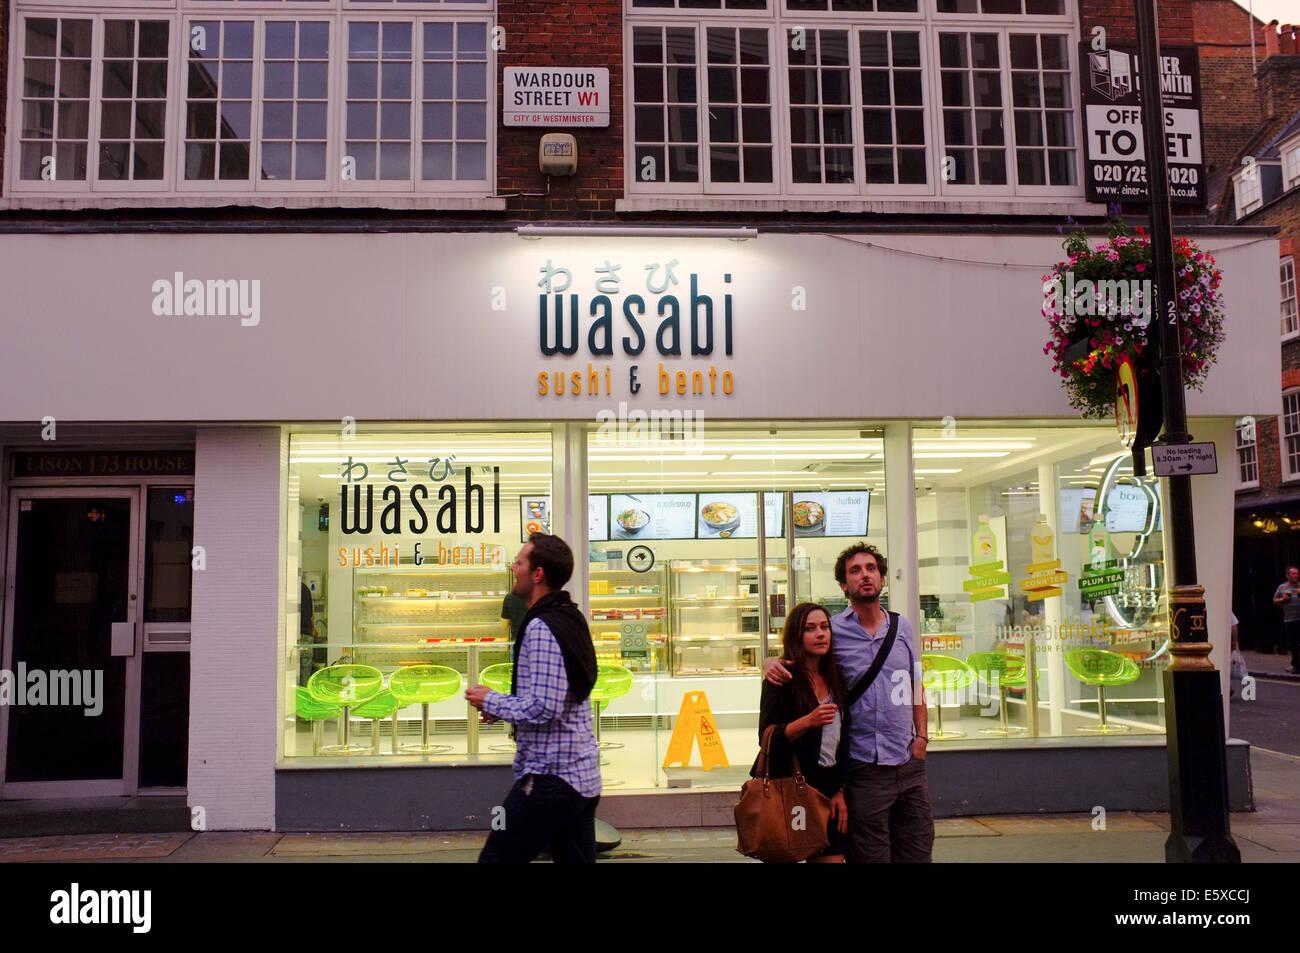 Wasabi sushi & bento Japanese takeaway on Wardour Street, Soho, London - Stock Image